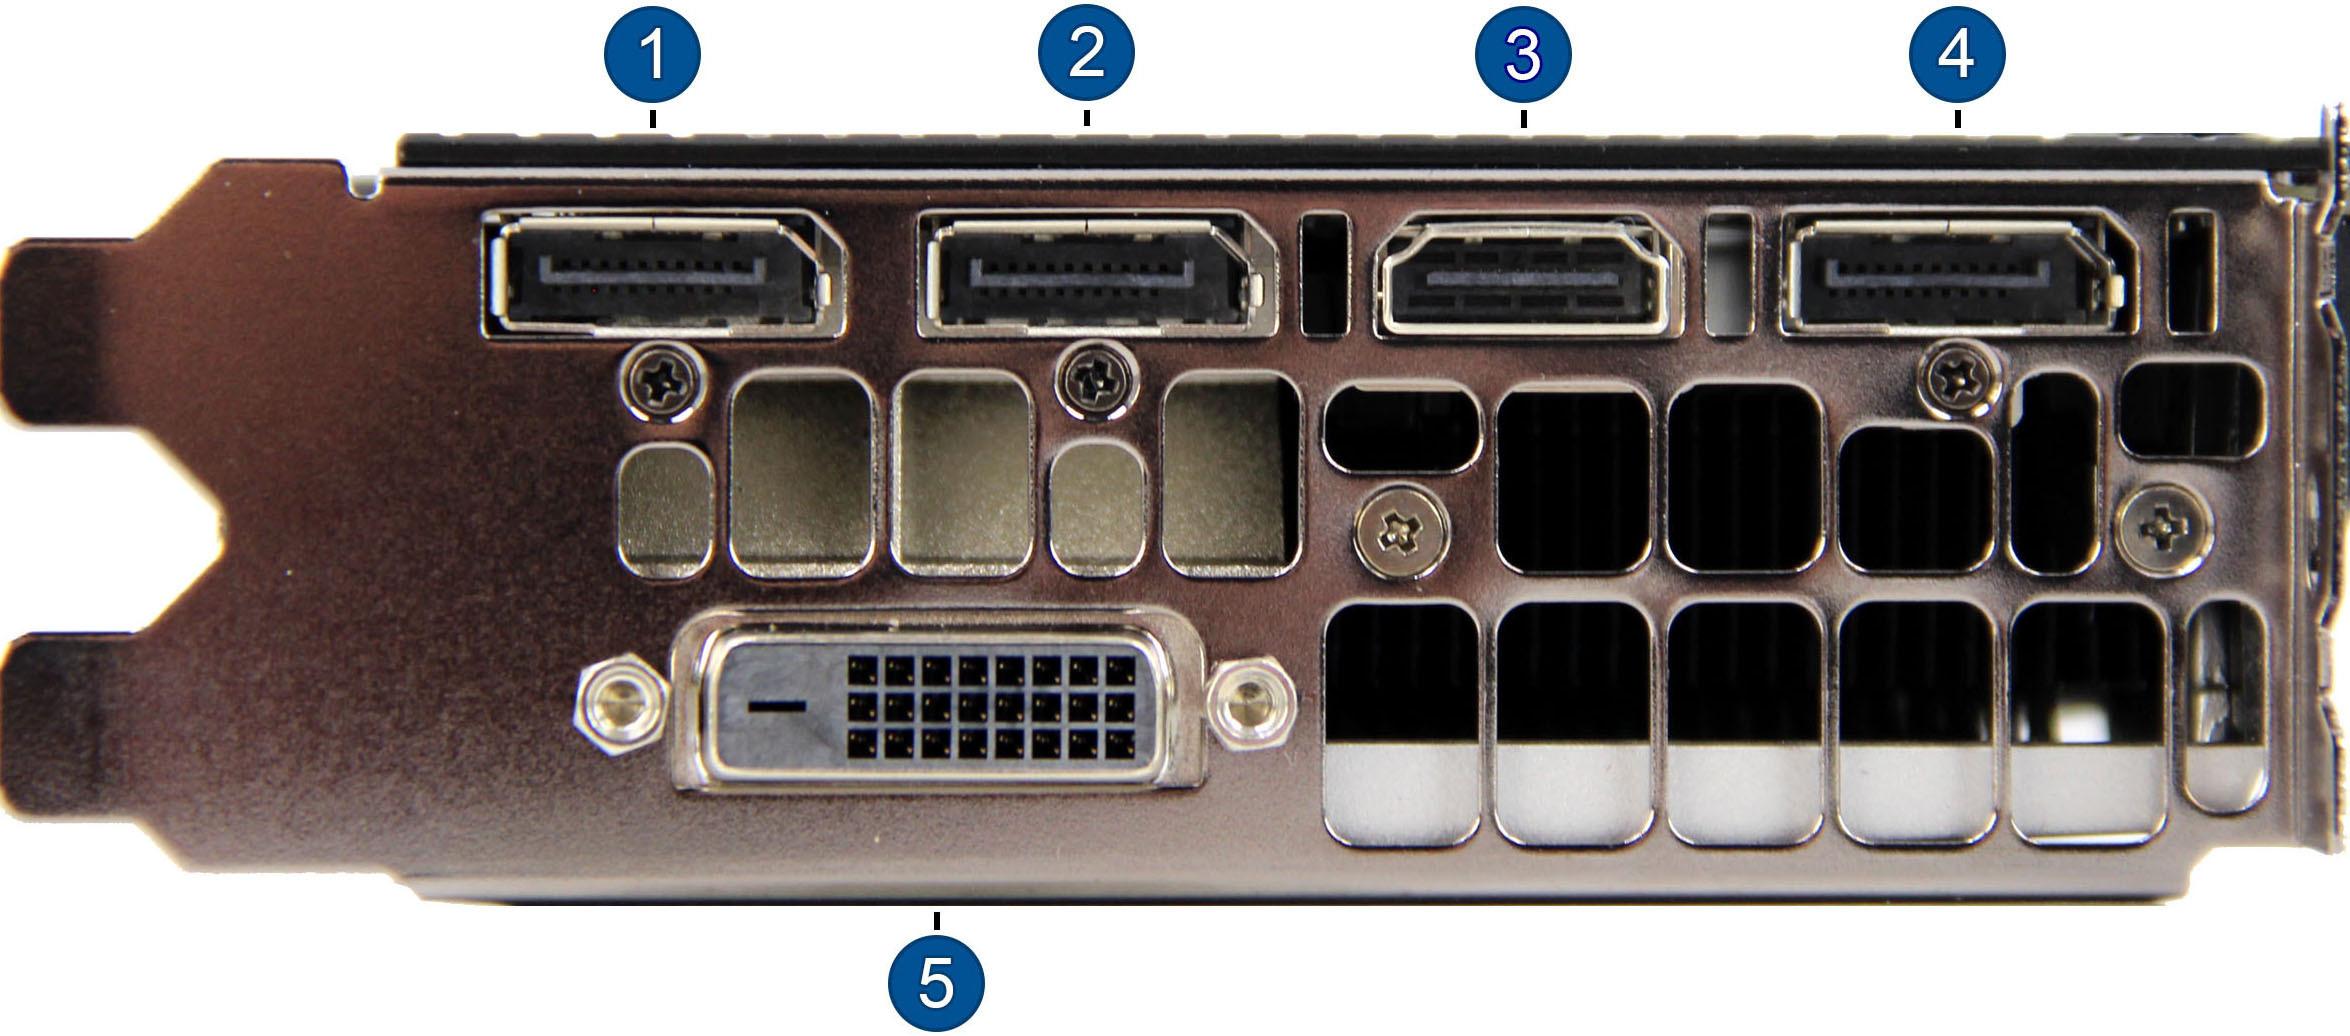 Configure PC w/ Gigabyte GeForce GTX 1070 8GB Video Card